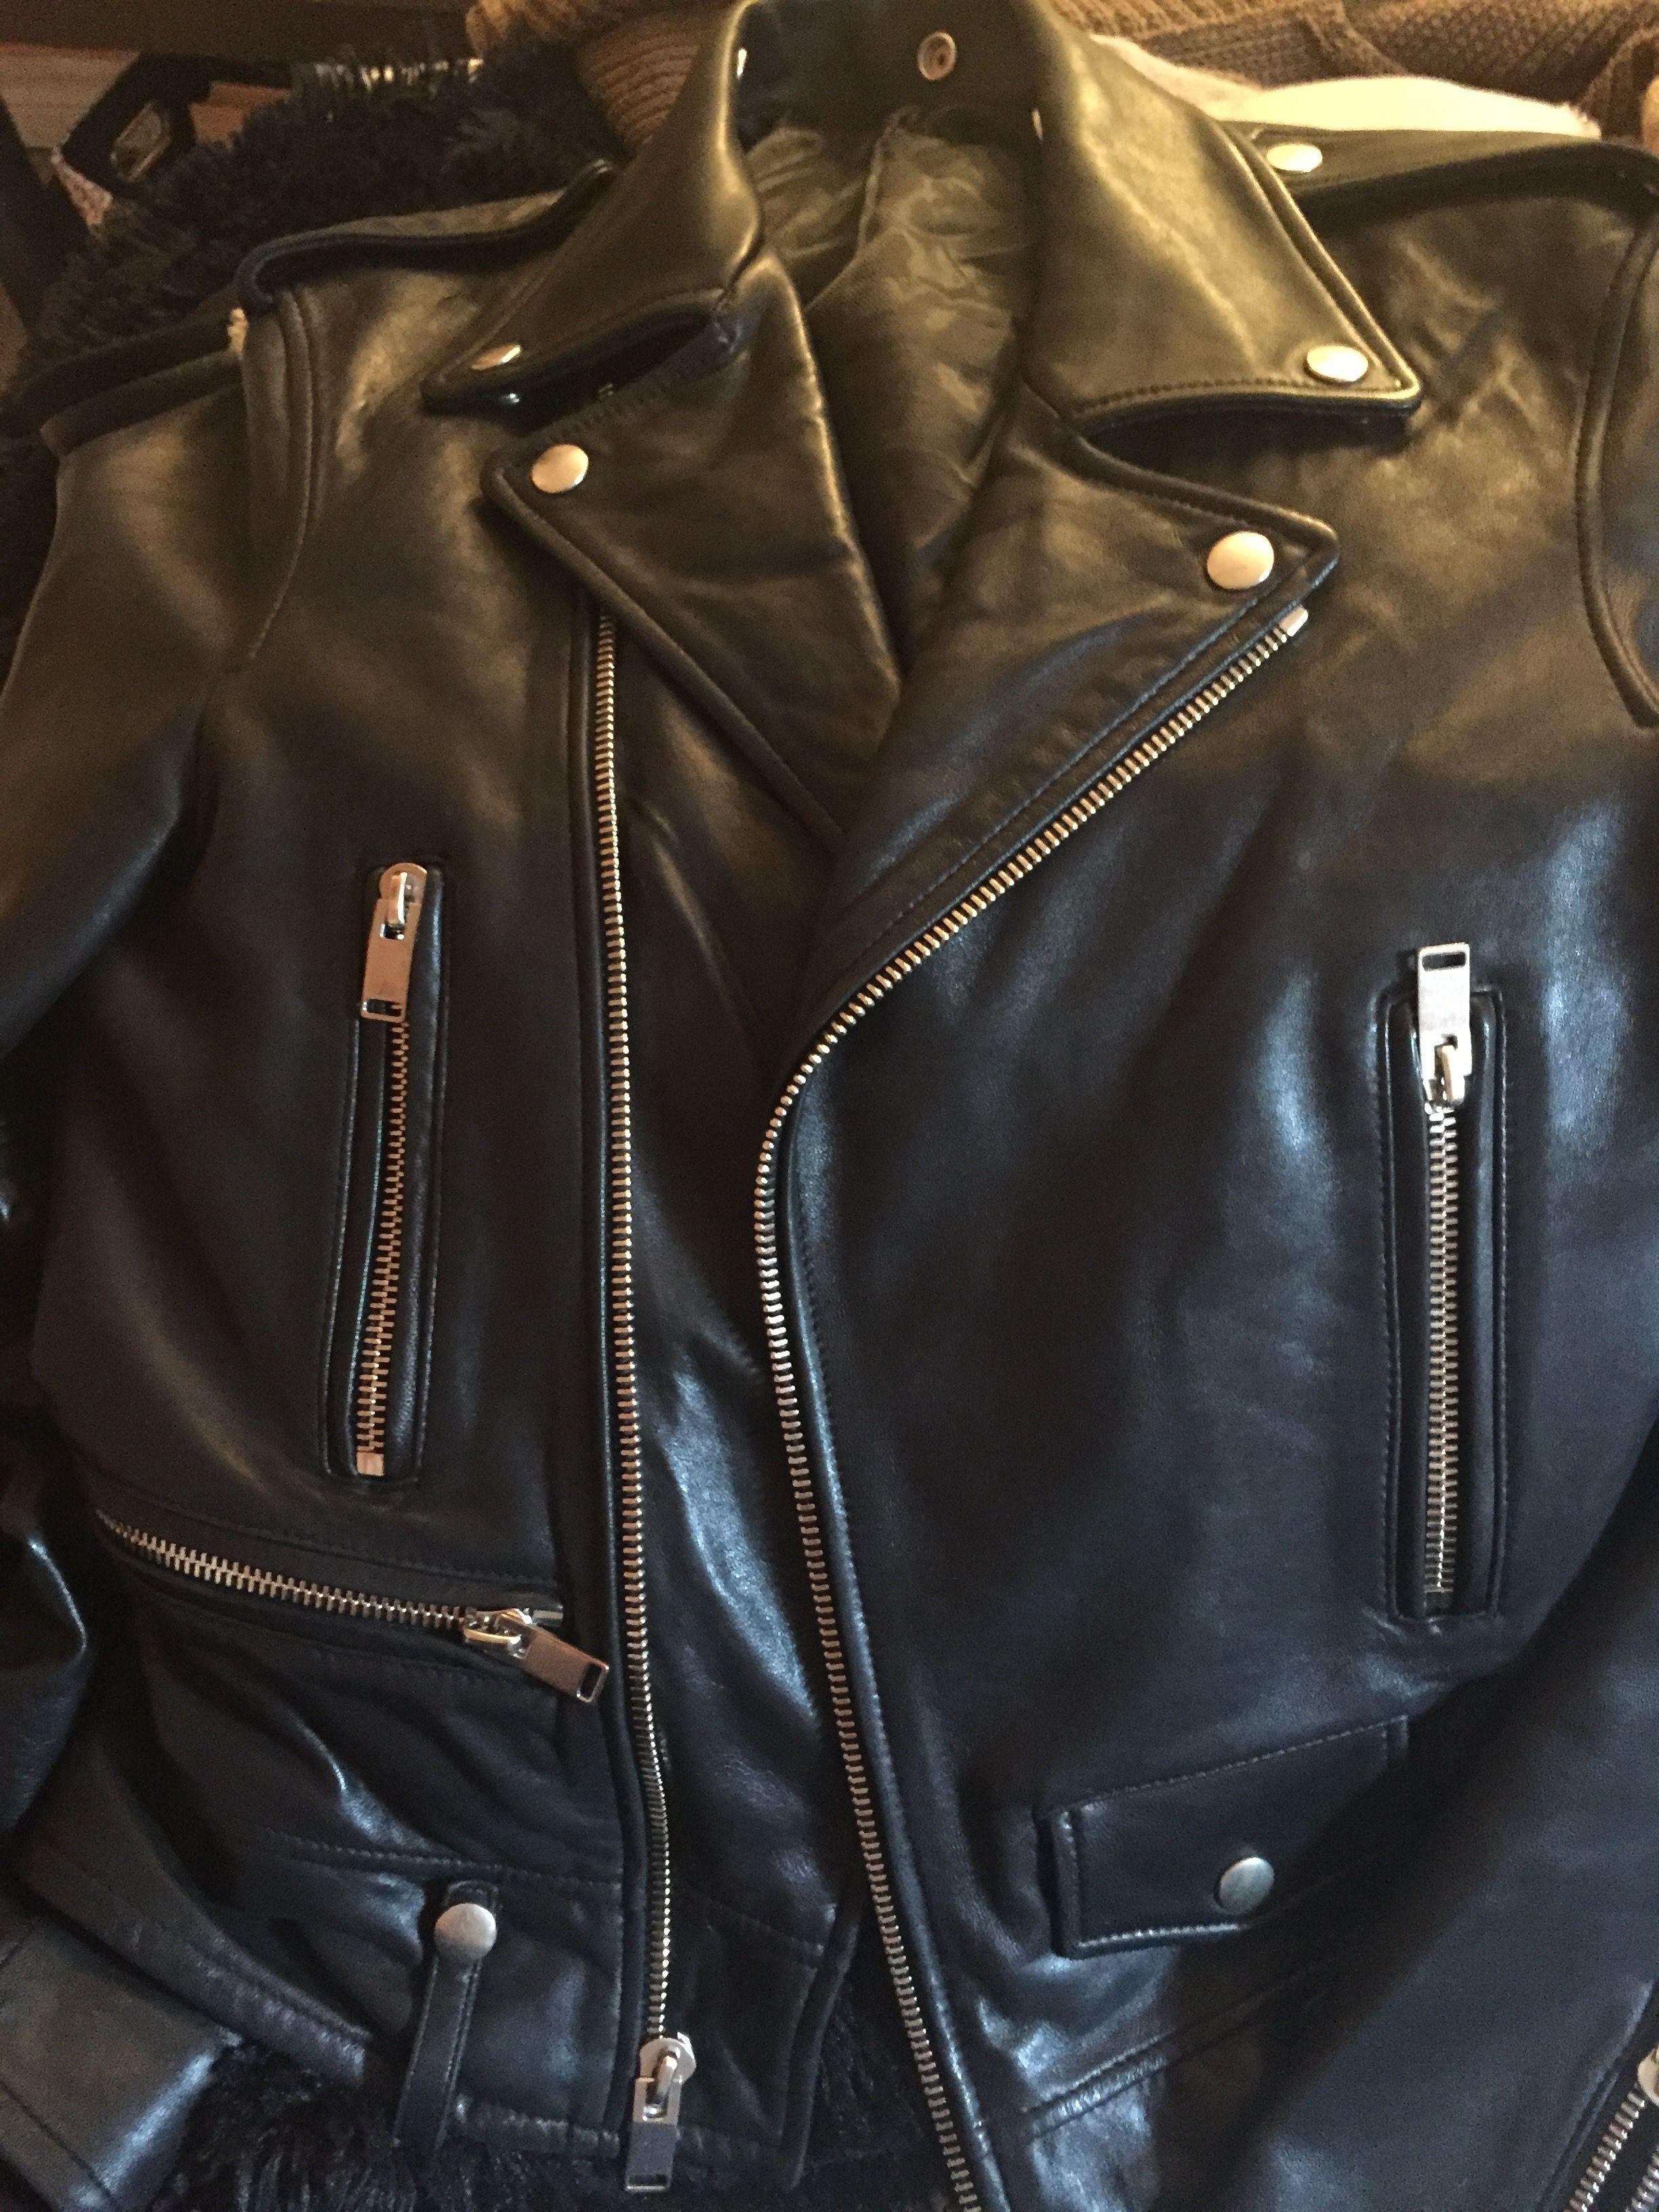 Leather jacket repair toronto - Leather Jacket Repair Toronto 11